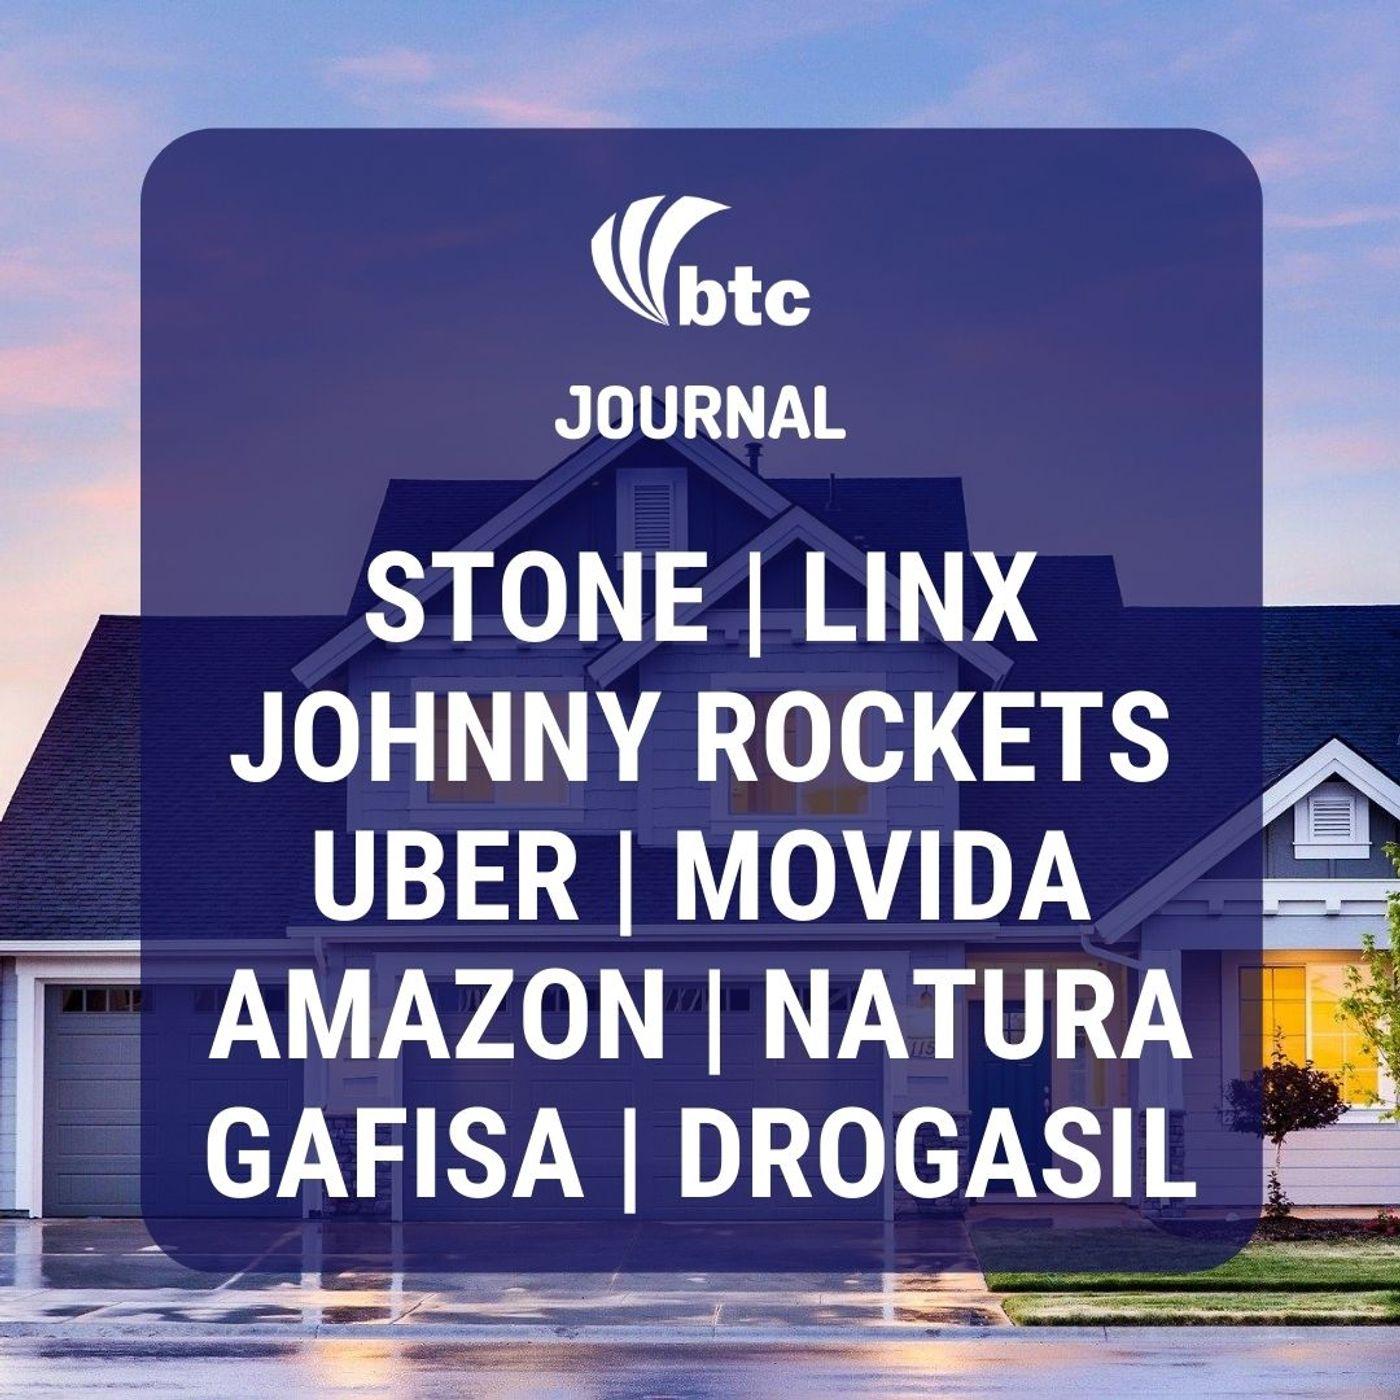 Stone, Linx, Johnny Rockets, Uber, Movida, Gafisa e Natura | BTC Journal 13/08/20